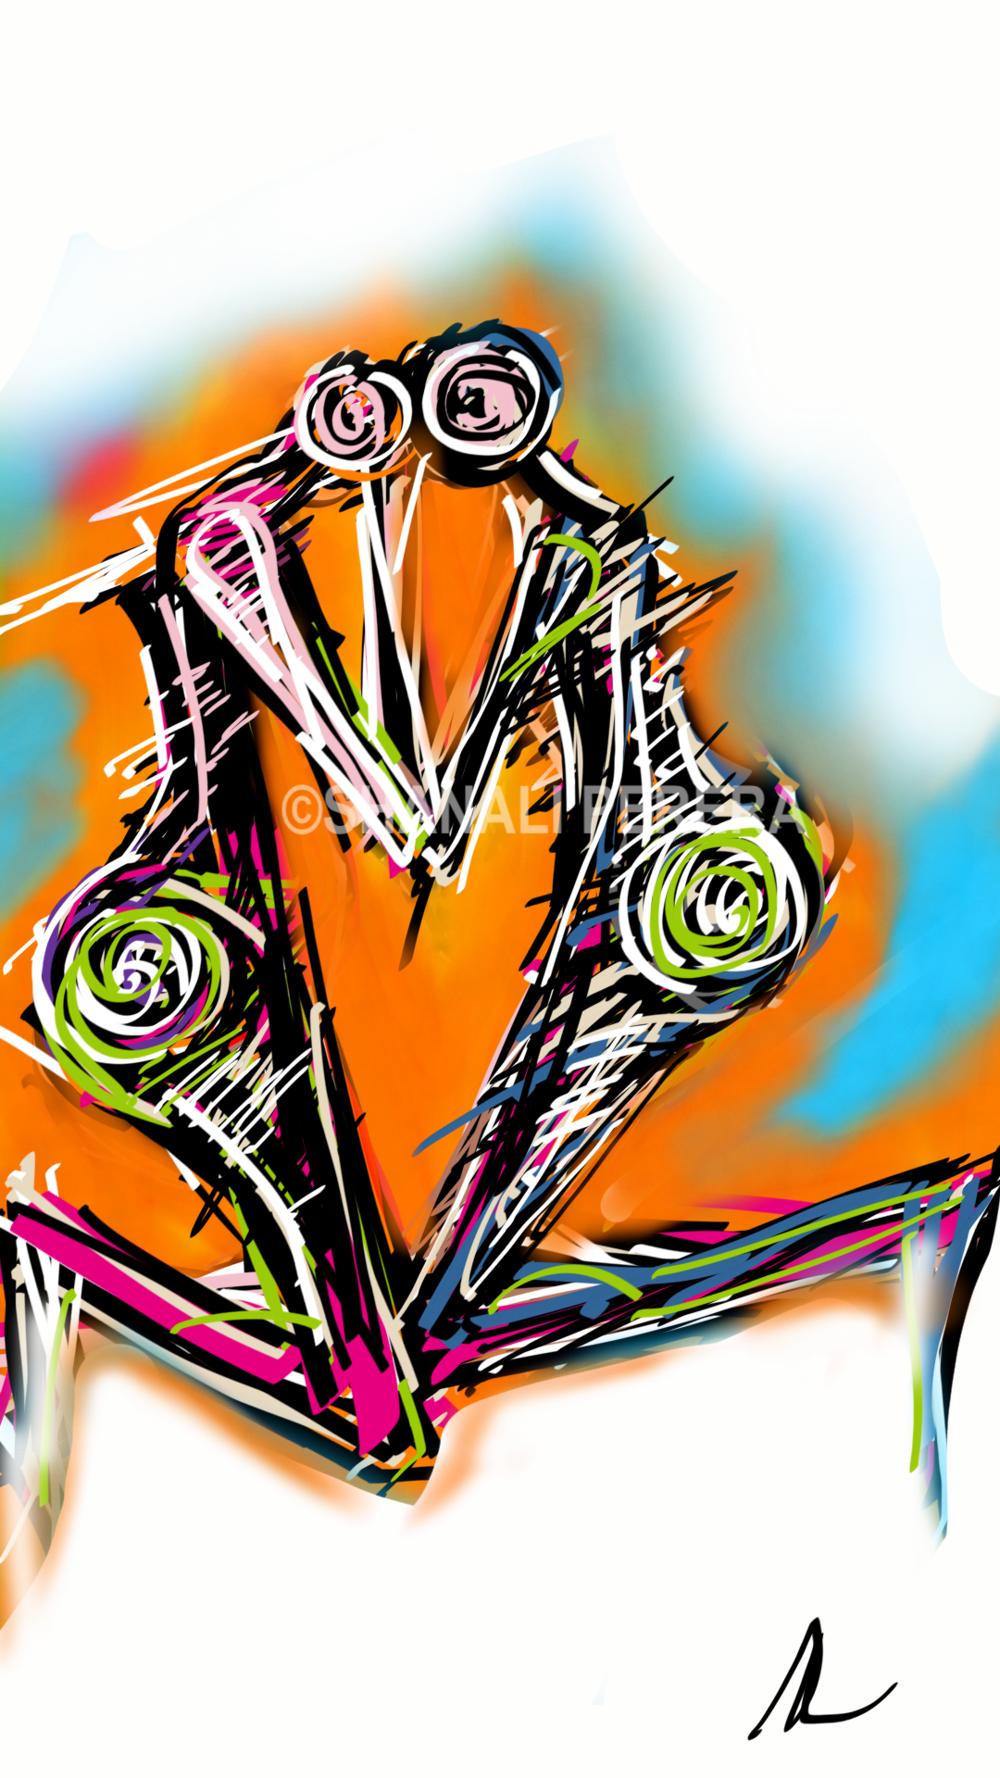 sketch-1516991492292.png